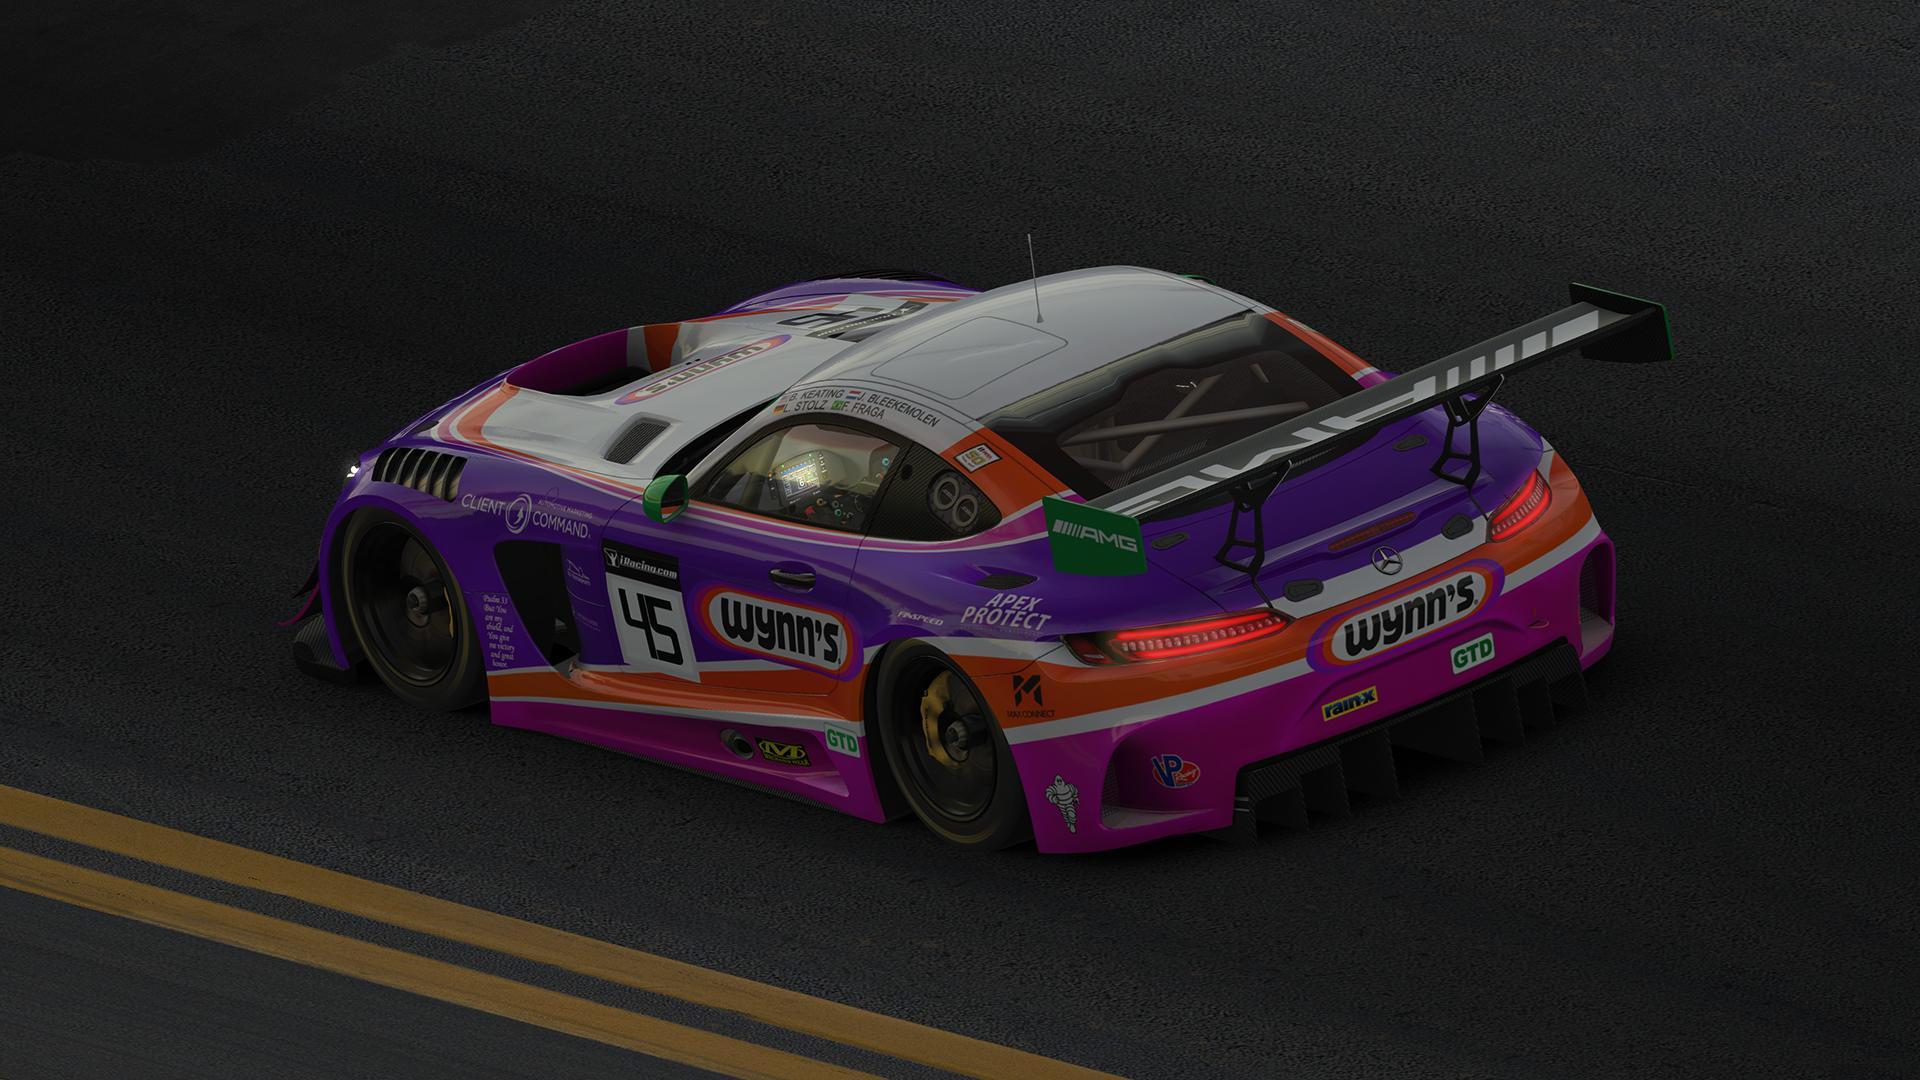 Preview of 2019 IMSA GTD - #33 Riley Motorsports (Fixed for 19S2 Update) by Jann Dircks